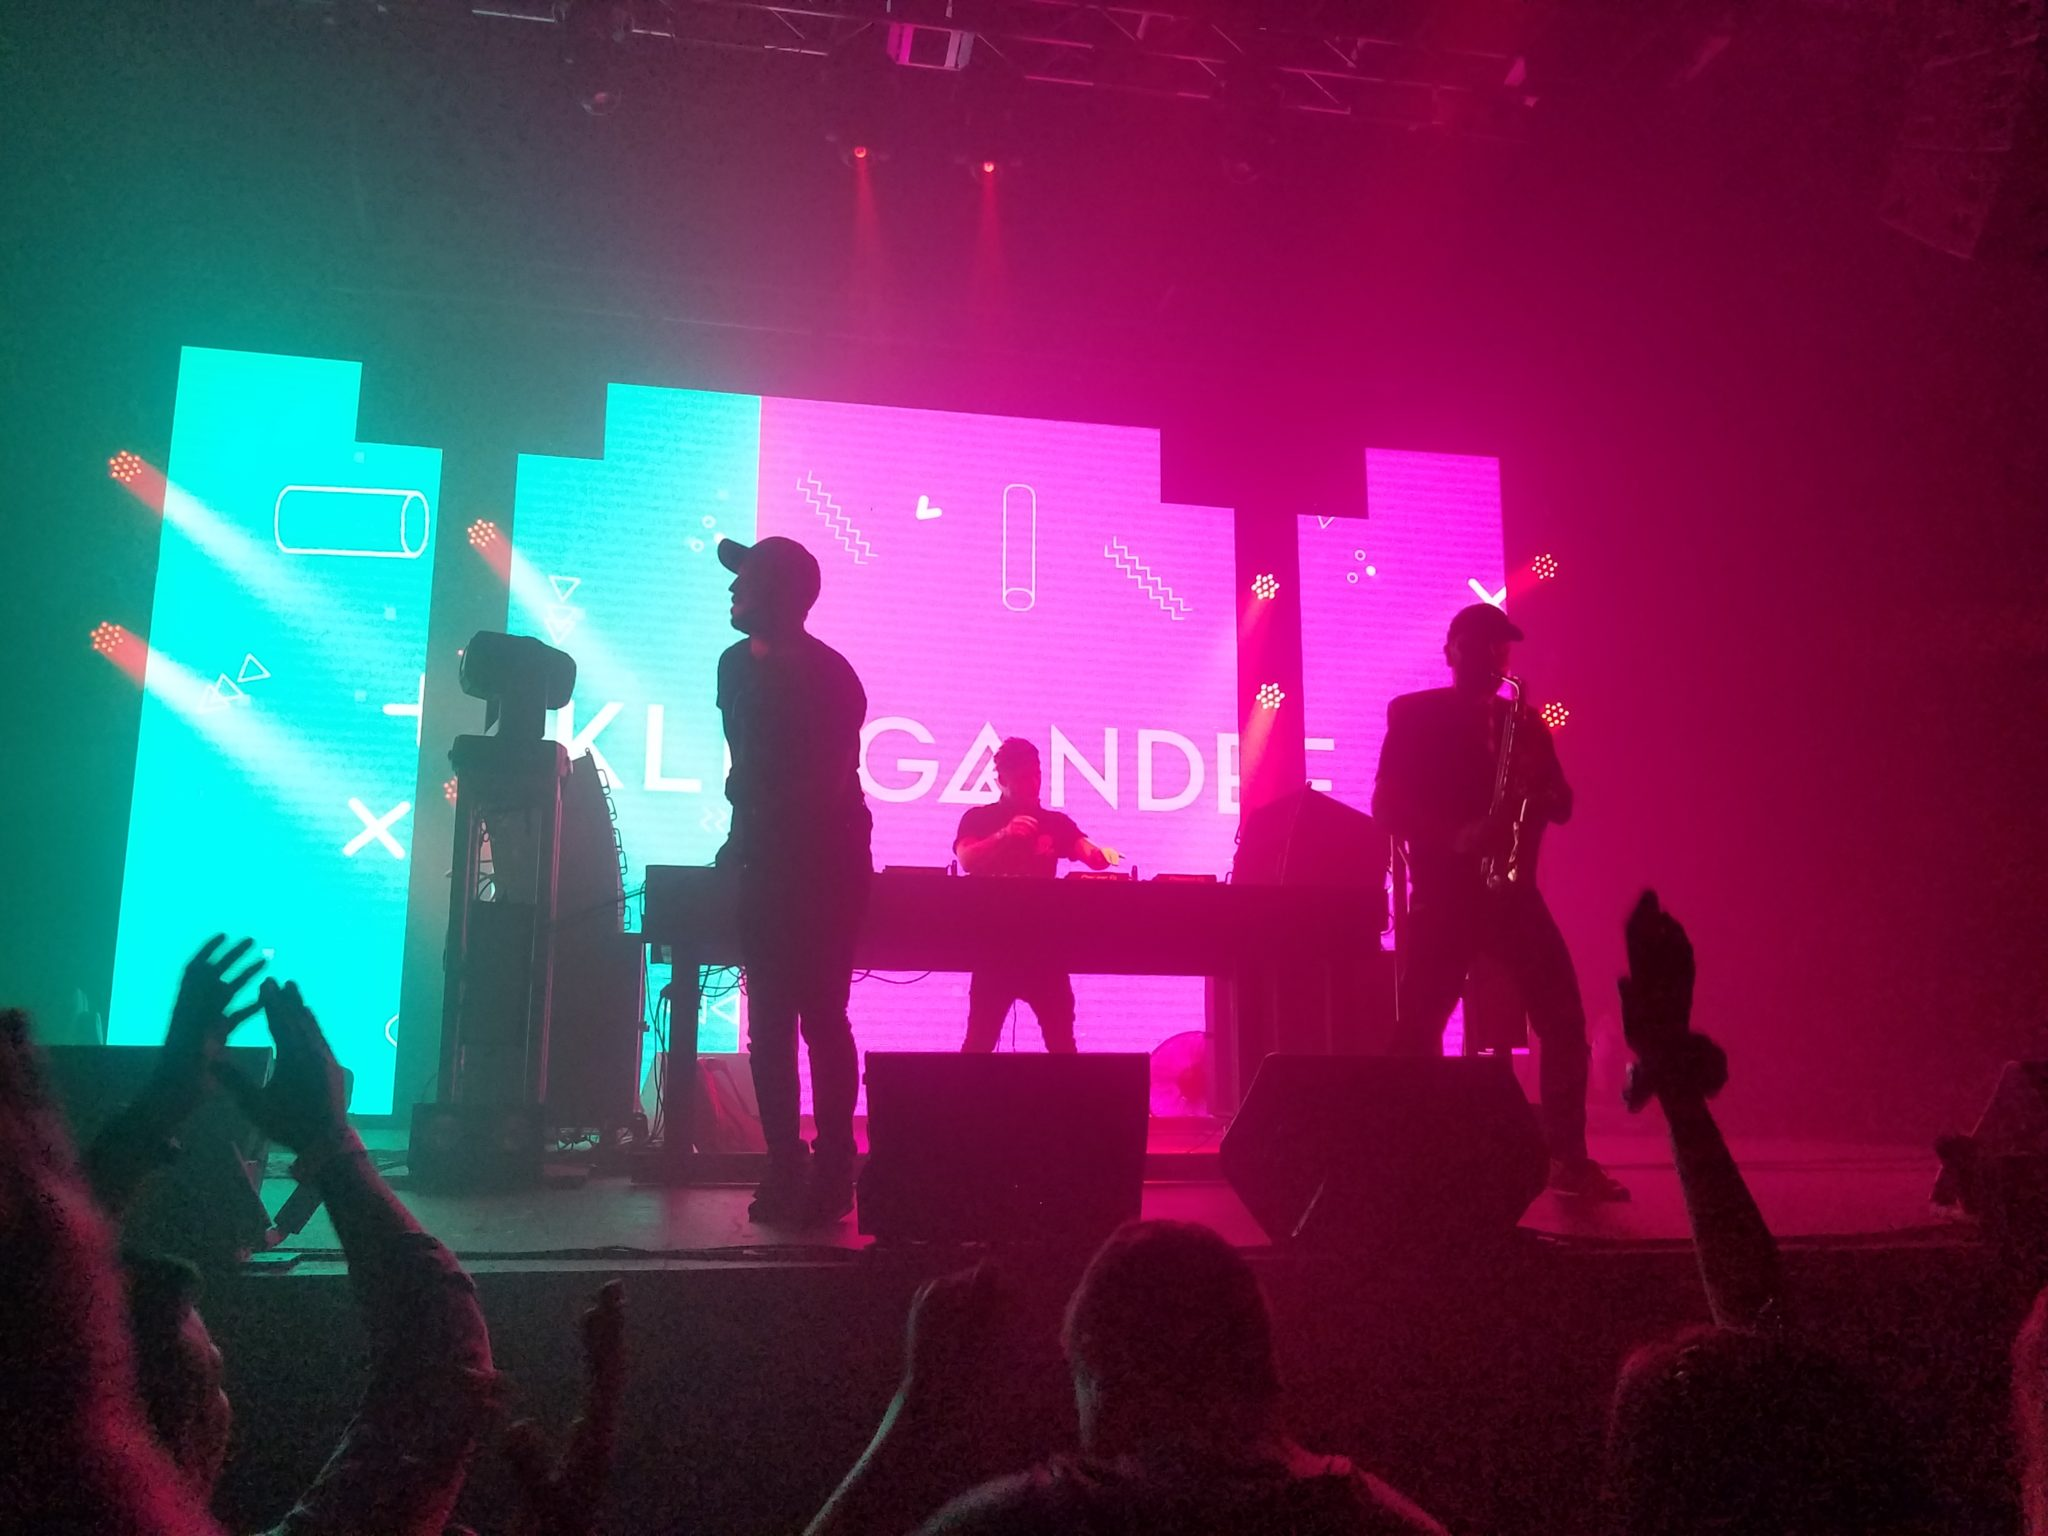 Concert Review: Klingande